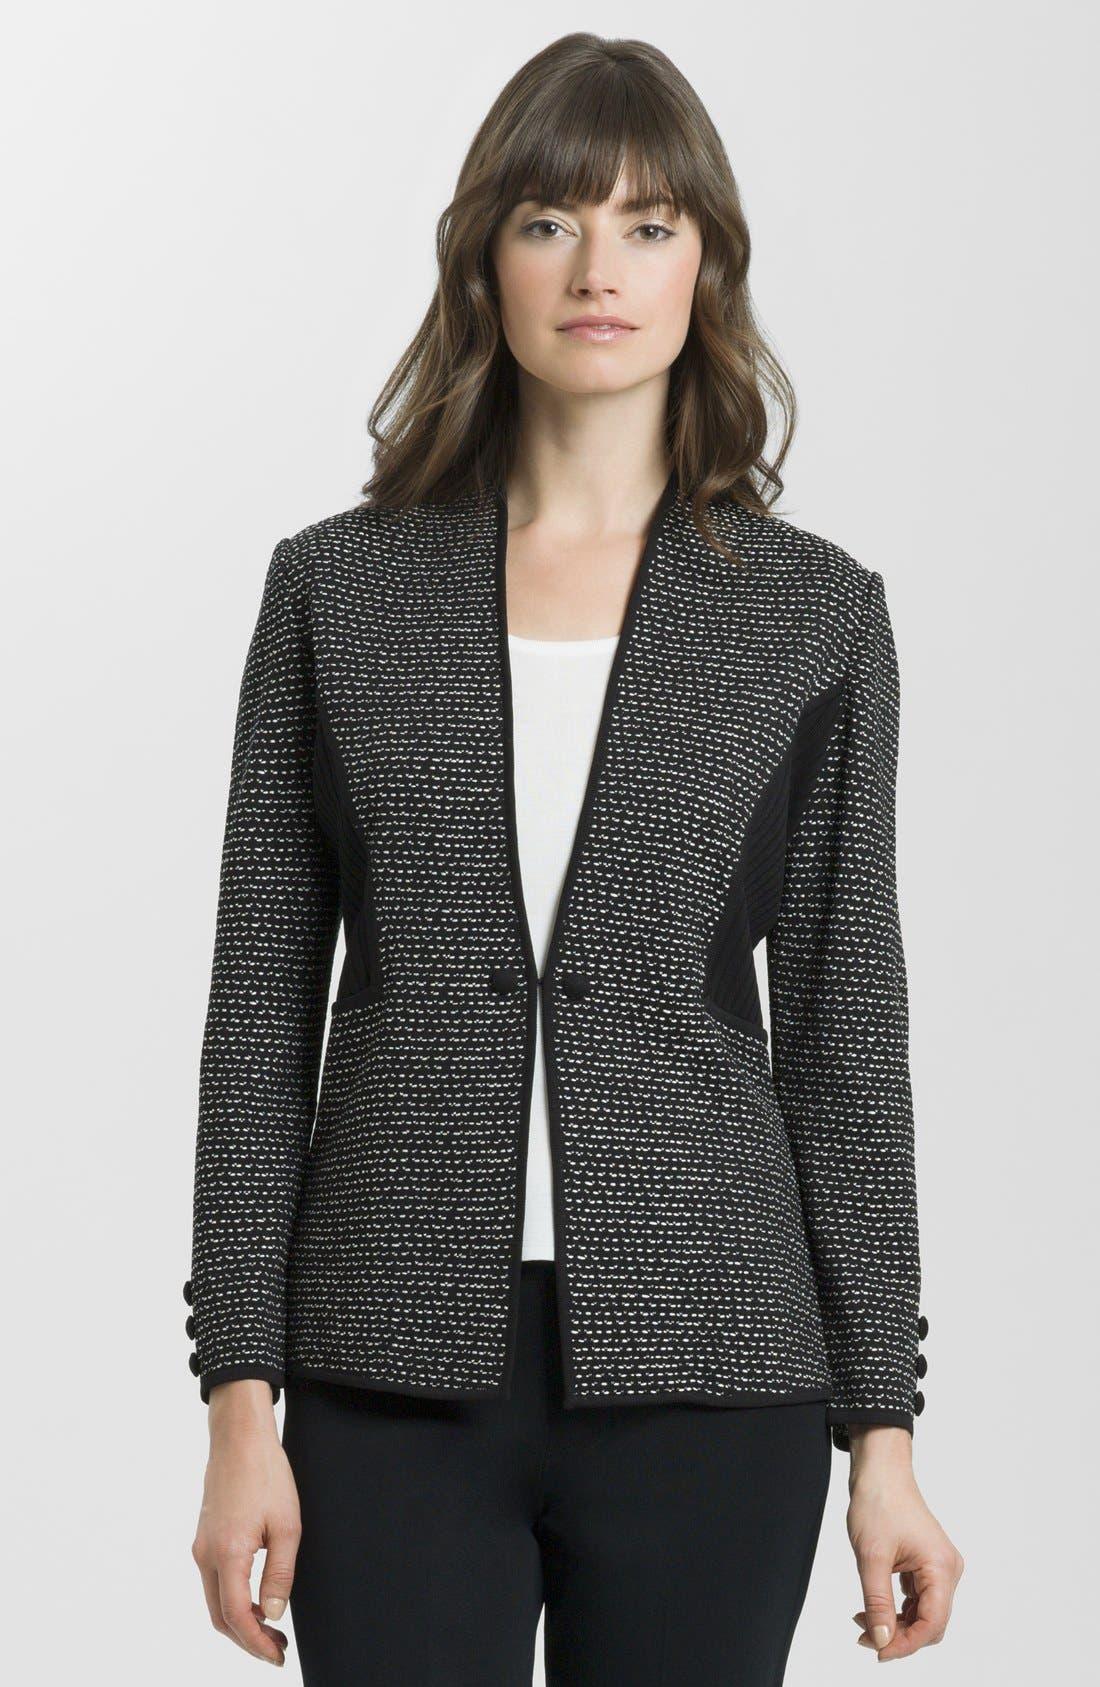 Alternate Image 1 Selected - Ming Wang Contrast Panel Knit Jacket